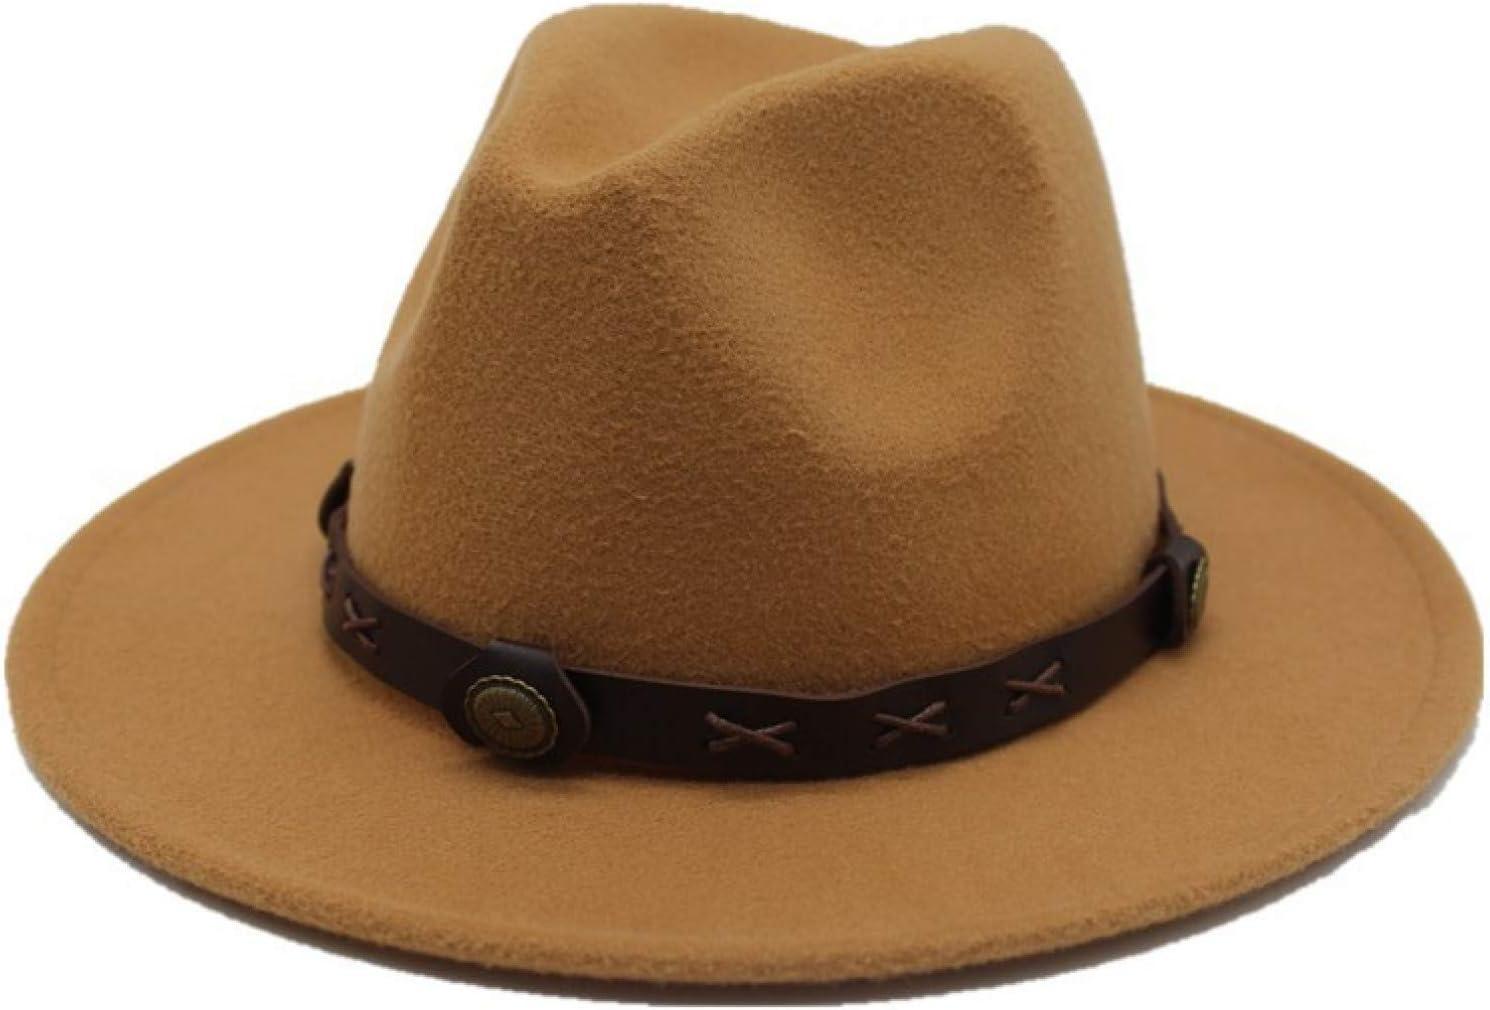 BAJIE Fedora Unisex Pure Wool Wide Brim Spring And Summer Felt Fedora Hat Ladies Headscarf Female Hat Top Hat Valentine Gift